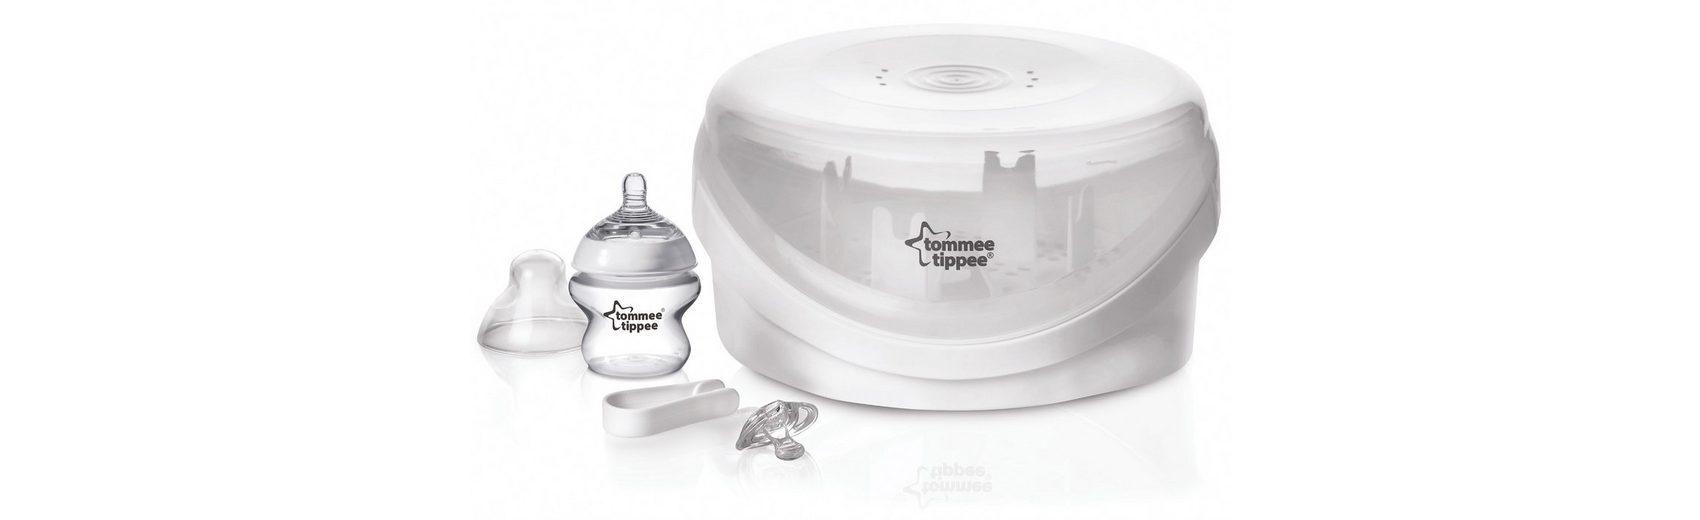 Tommee Tippee Mikrowellen- Sterilisator Set